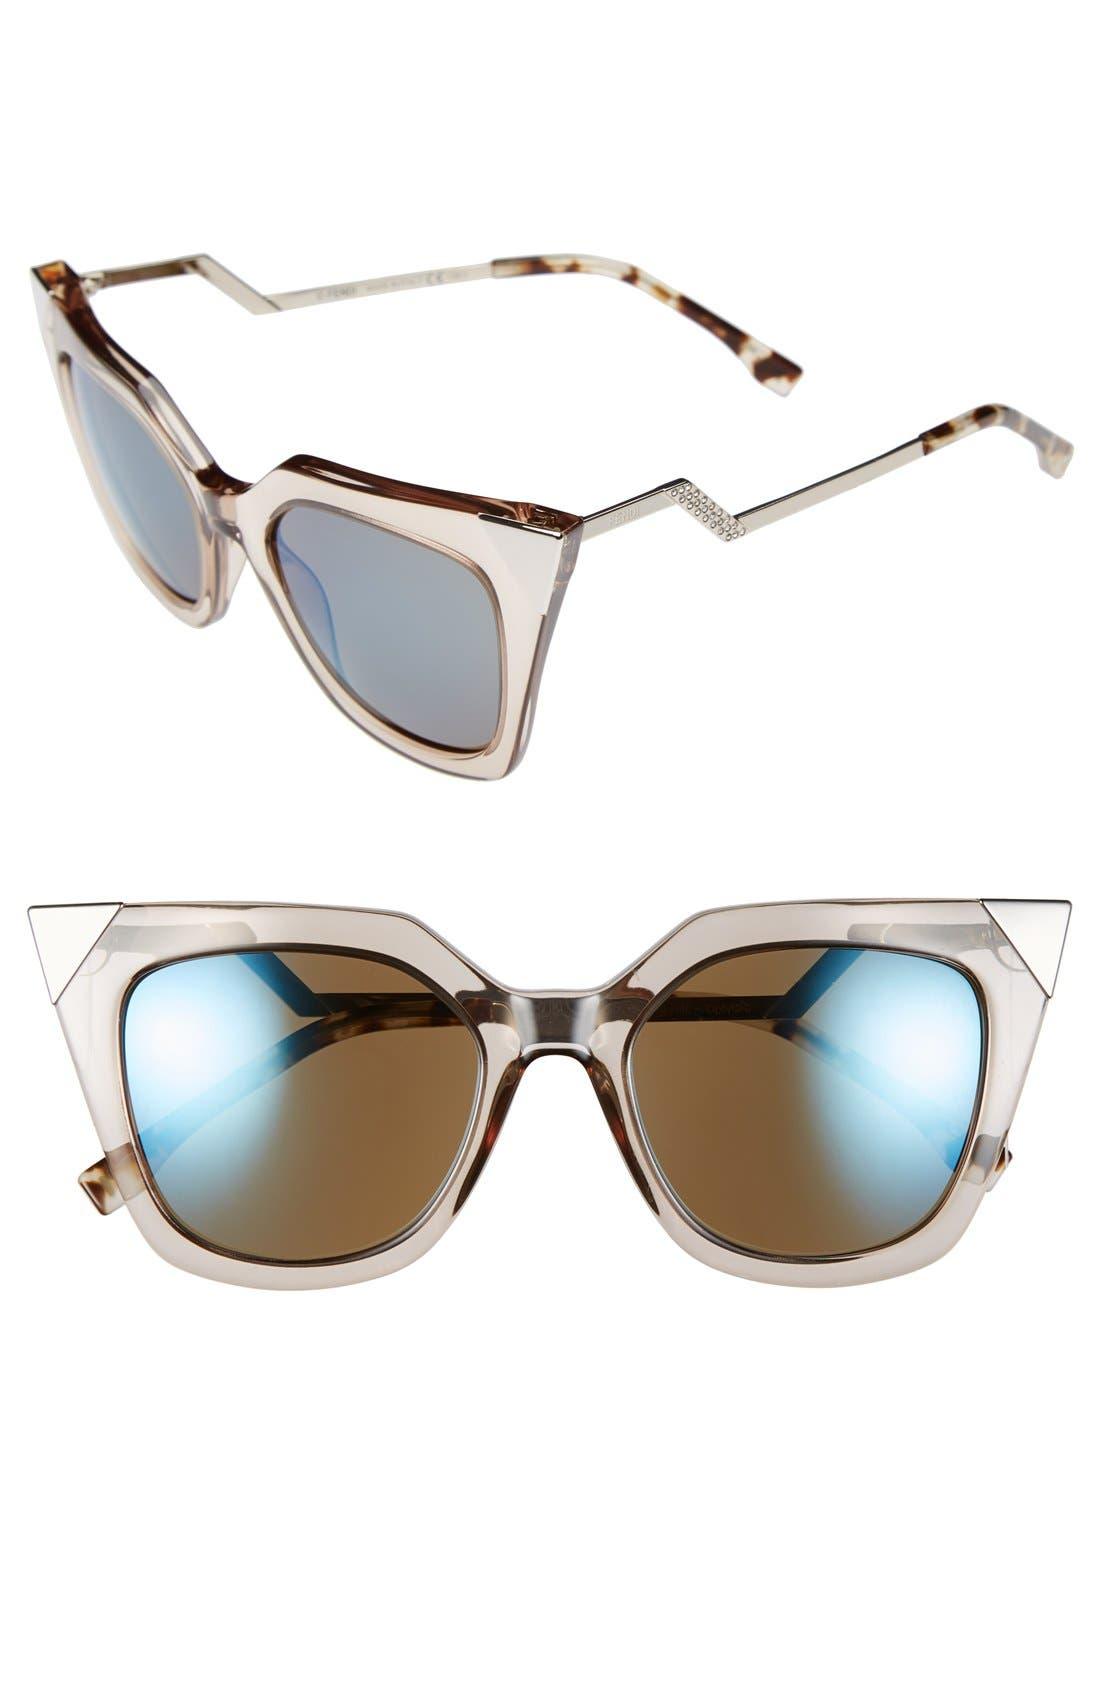 52mm Cat Eye Sunglasses,                             Main thumbnail 1, color,                             Dove Grey